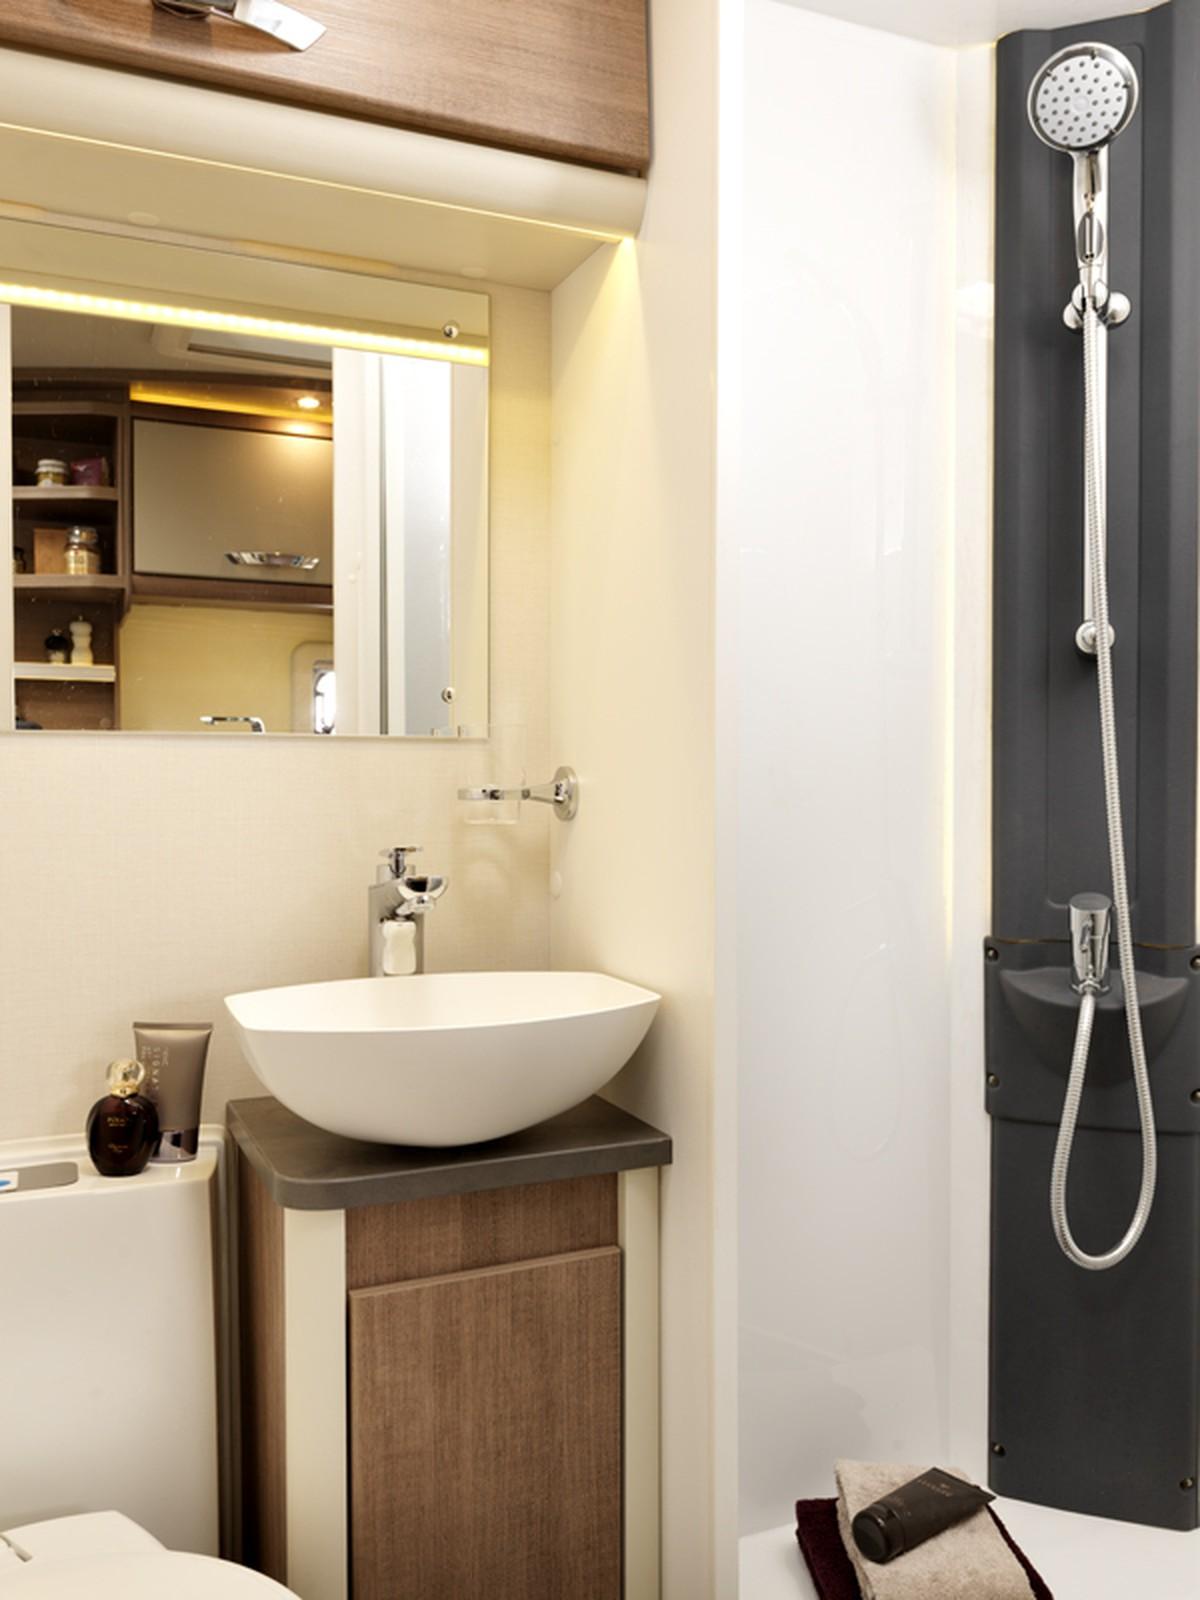 bathroom accessories perth scotland. lunar roadstar el 2 berth motorhome bathroom accessories perth scotland r